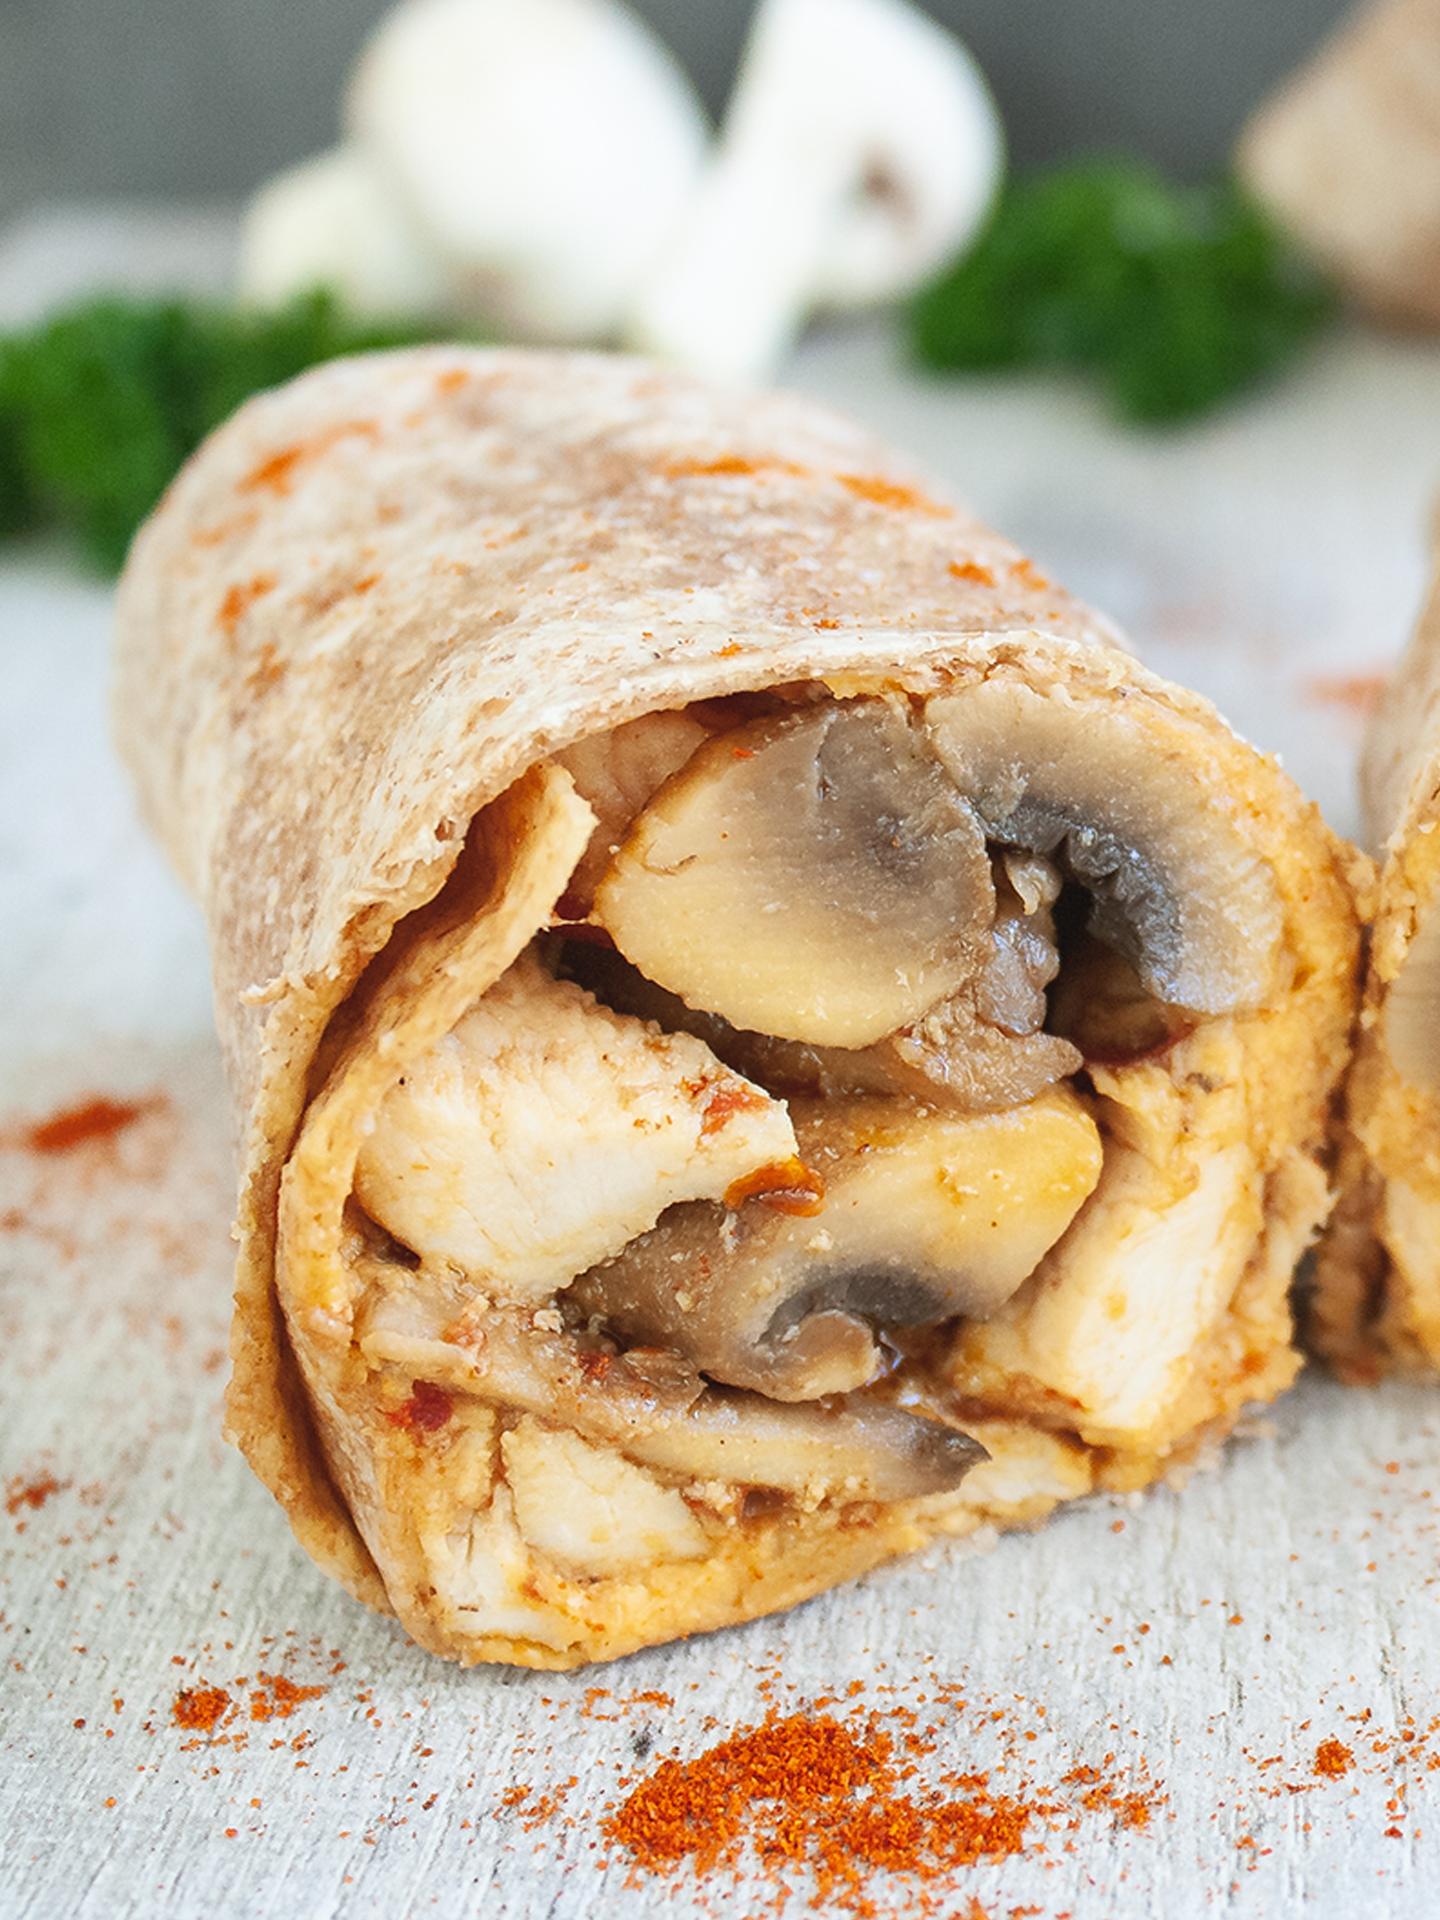 Spicy Chicken and Mushrooms Burrito with Creamy Smoked Paprika Hummus Thumbnail